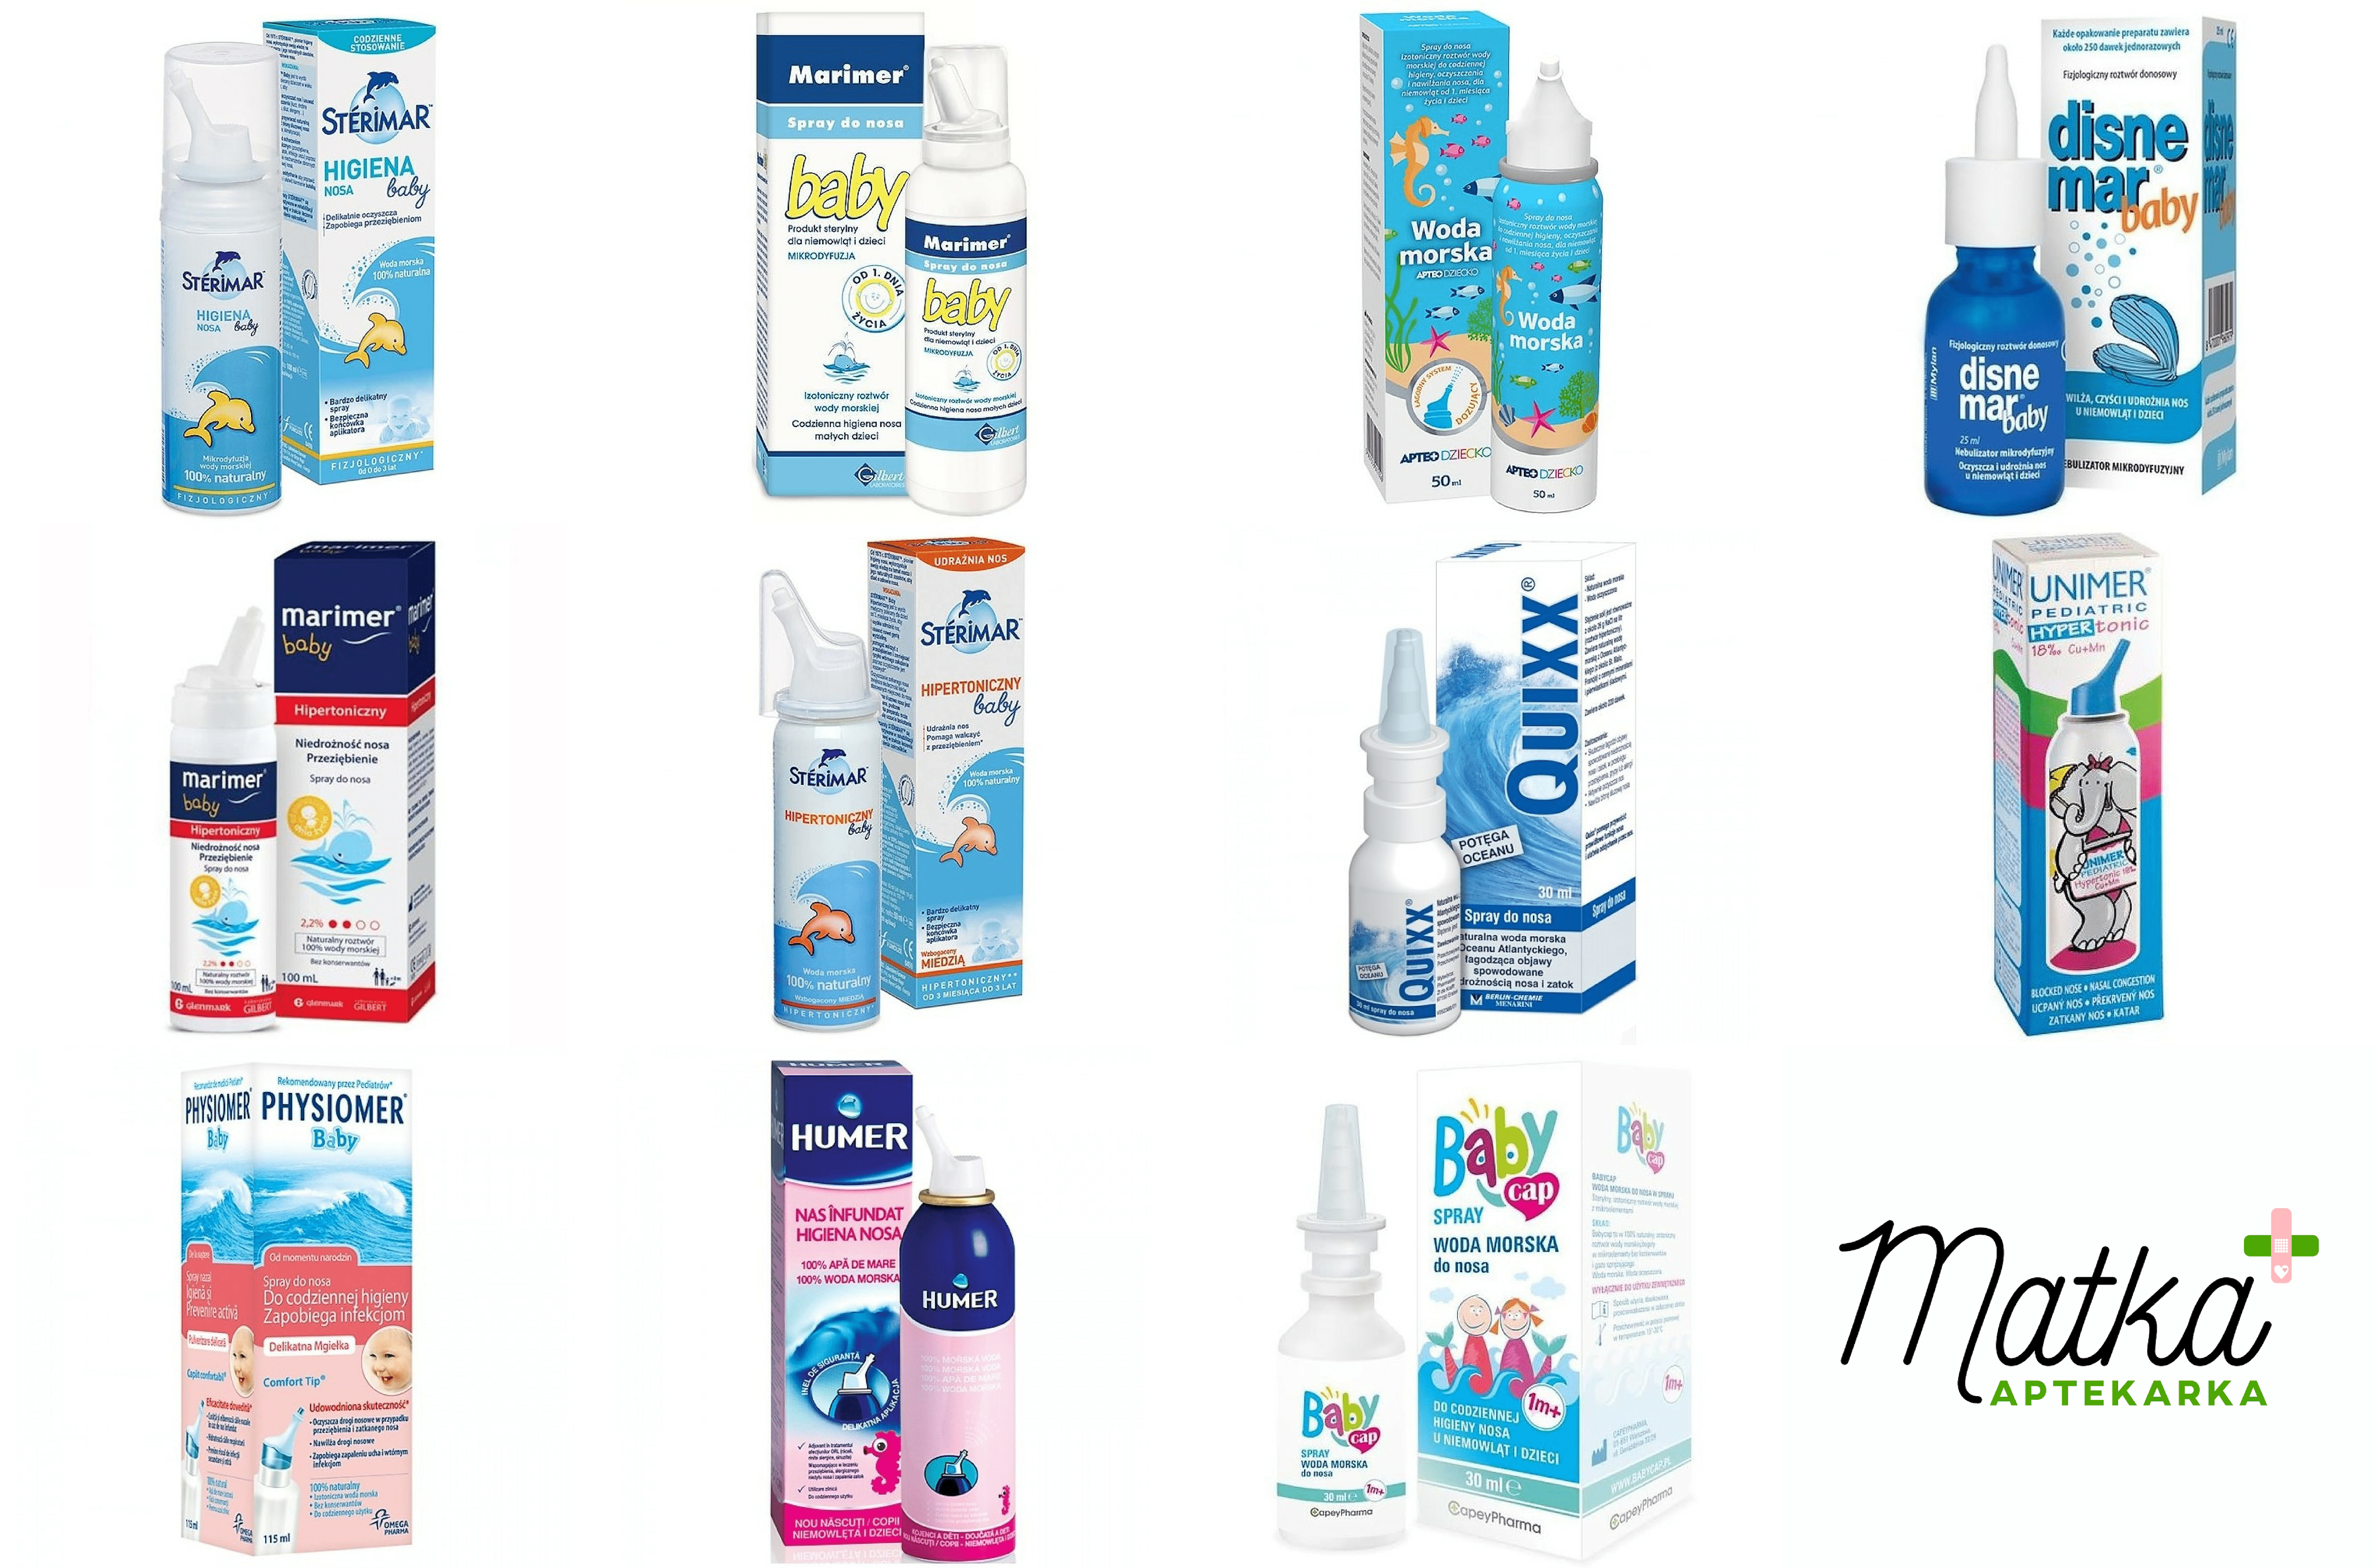 Woda morska, sól morska waerozolu donosa dla dzieci, Sterimar, Marimer, Disnemar, Unimer, Humer, NoseFrida, Matka Aptekarka